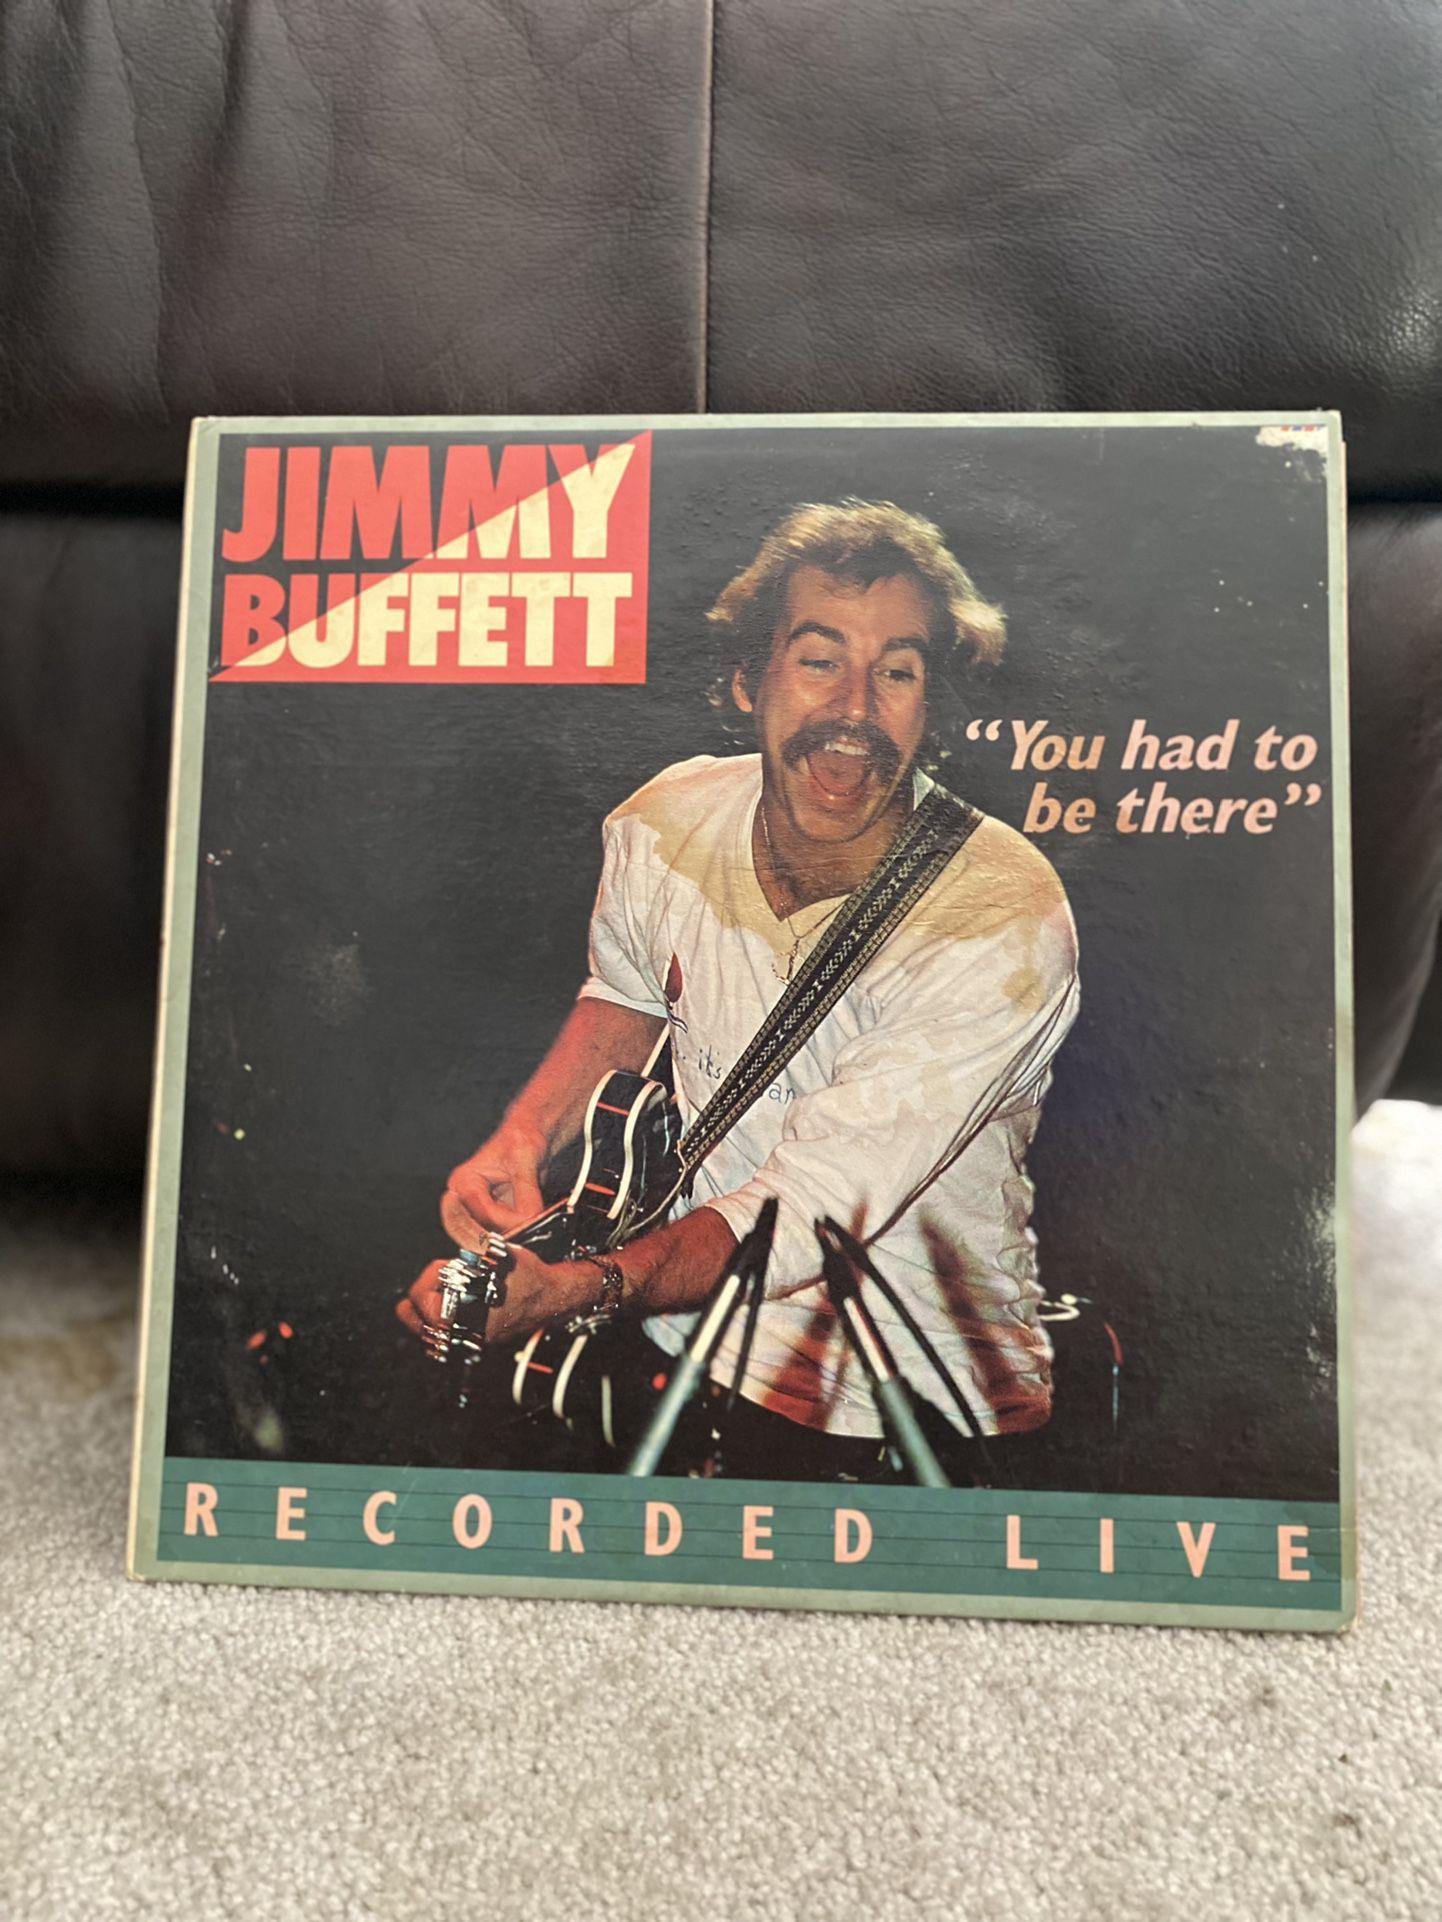 Jimmy Buffett Record